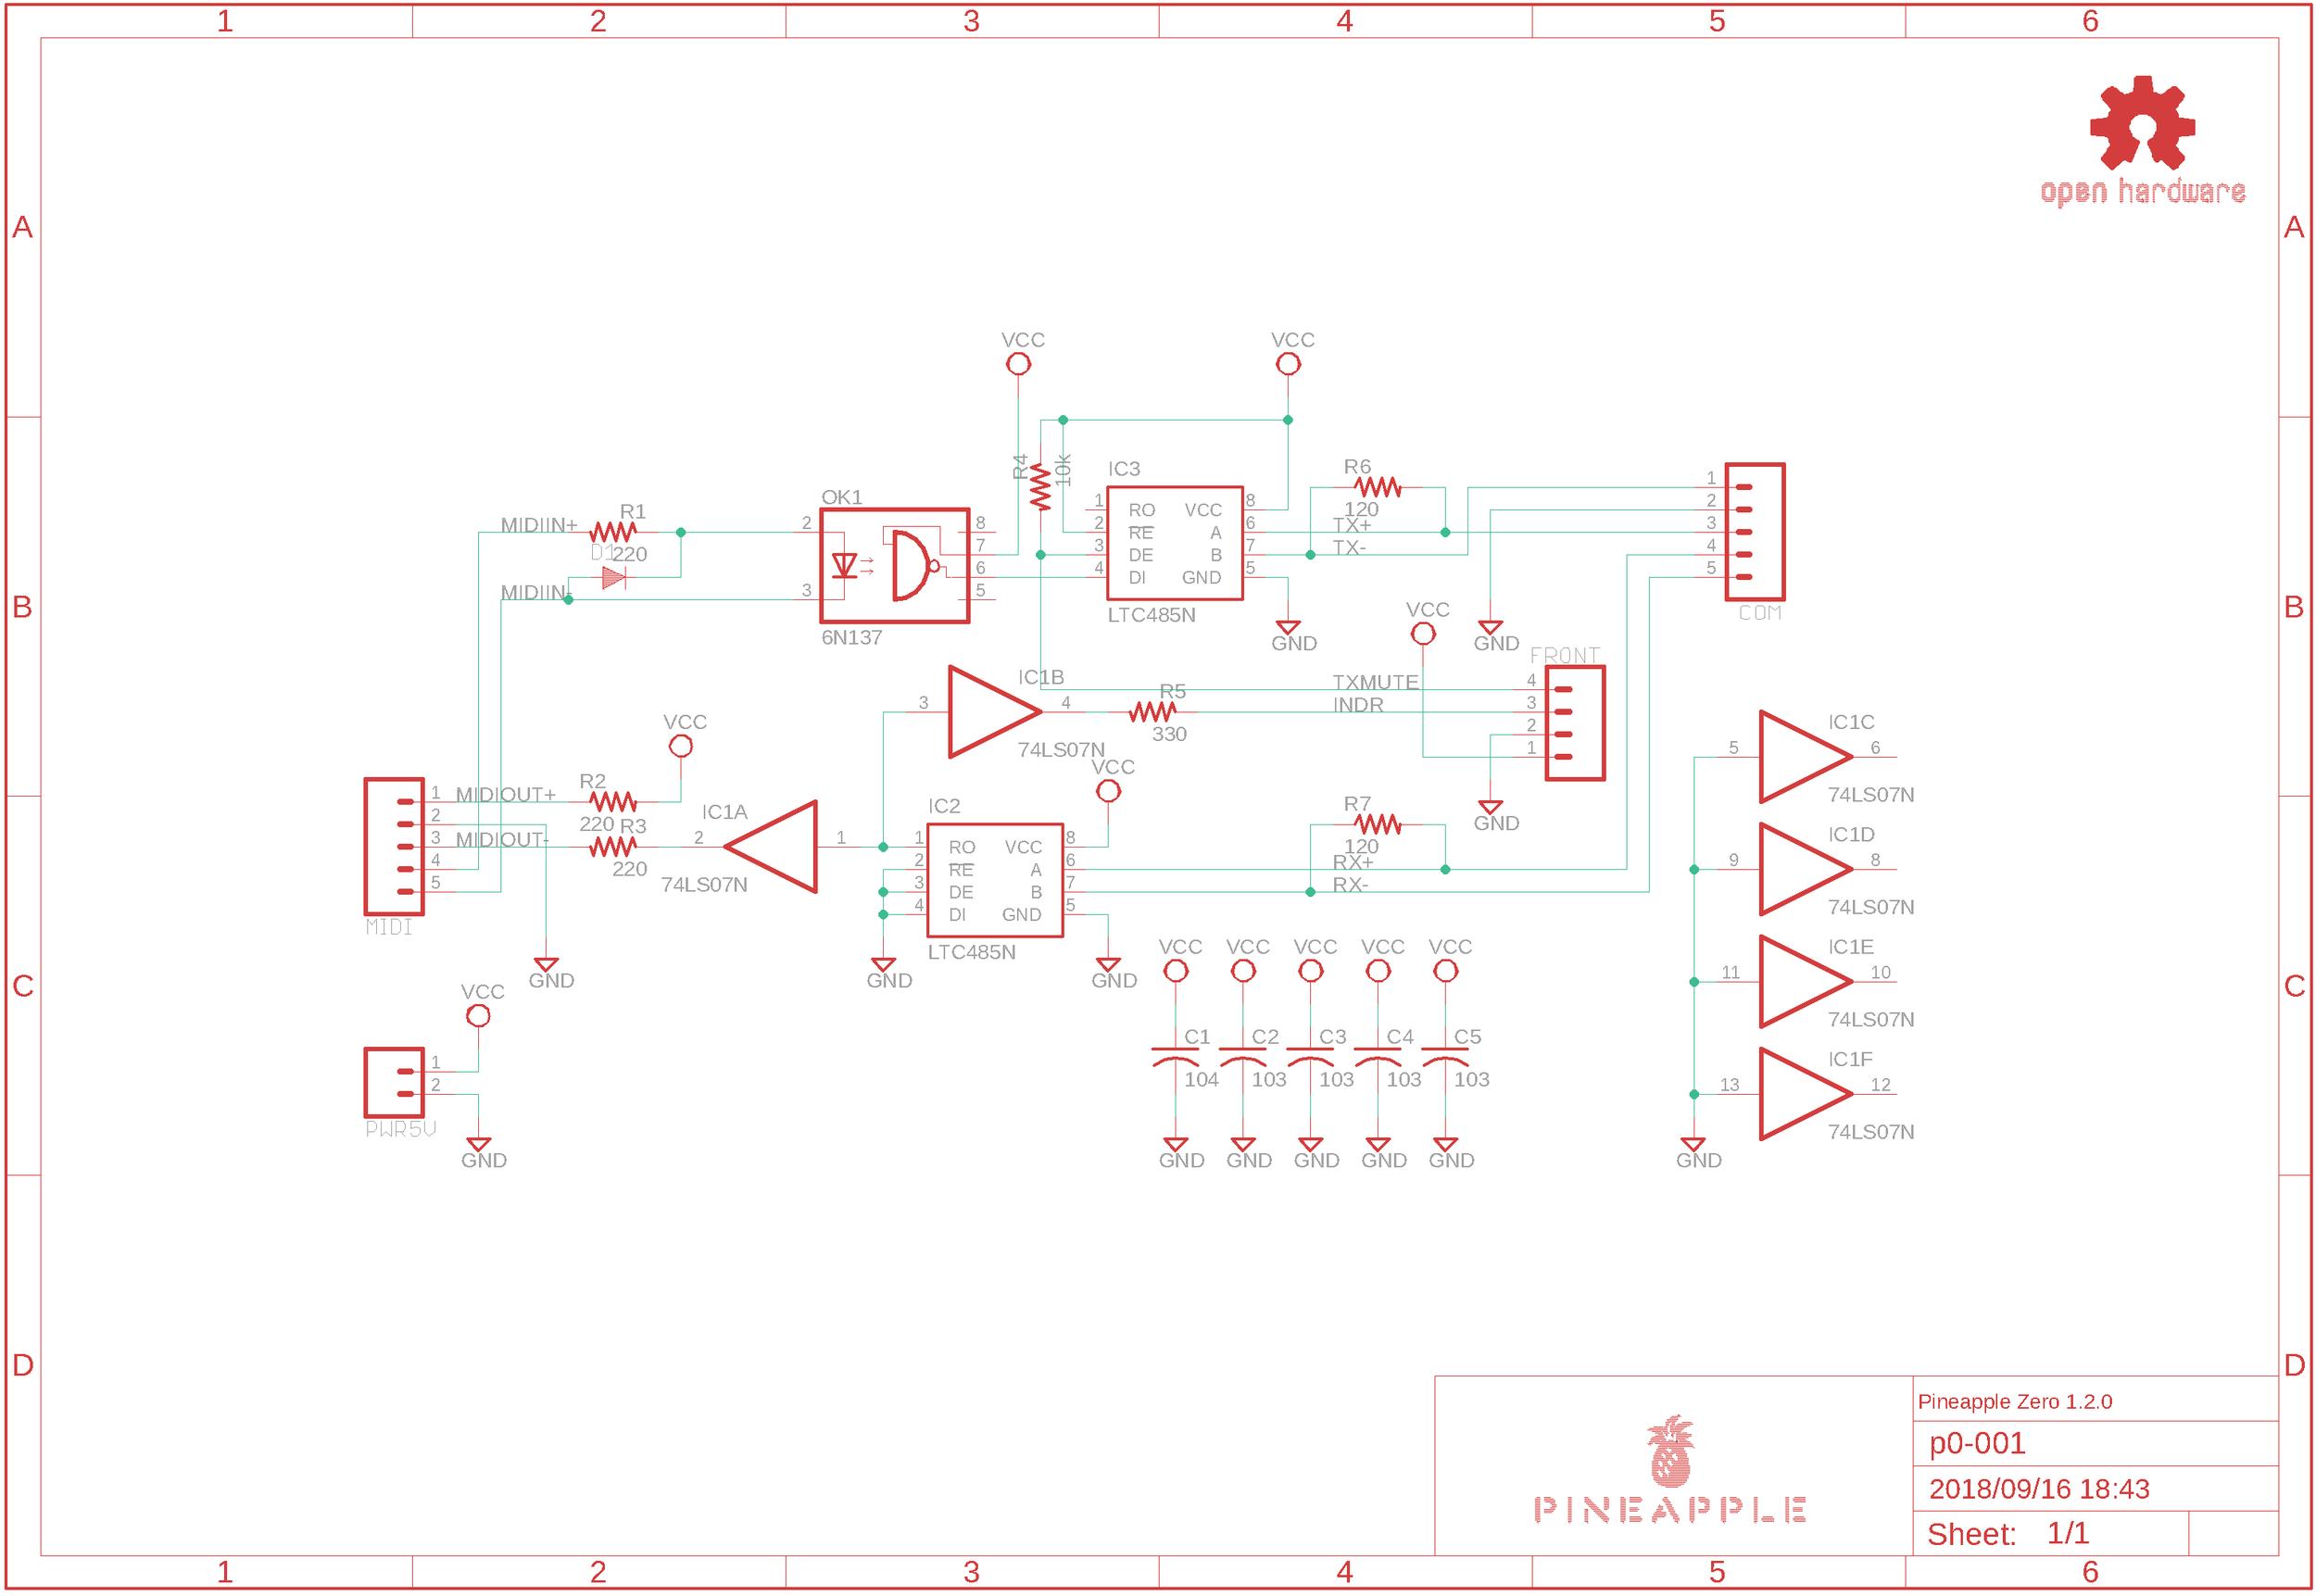 Schematic of Pineapple Zero (prerelease version)